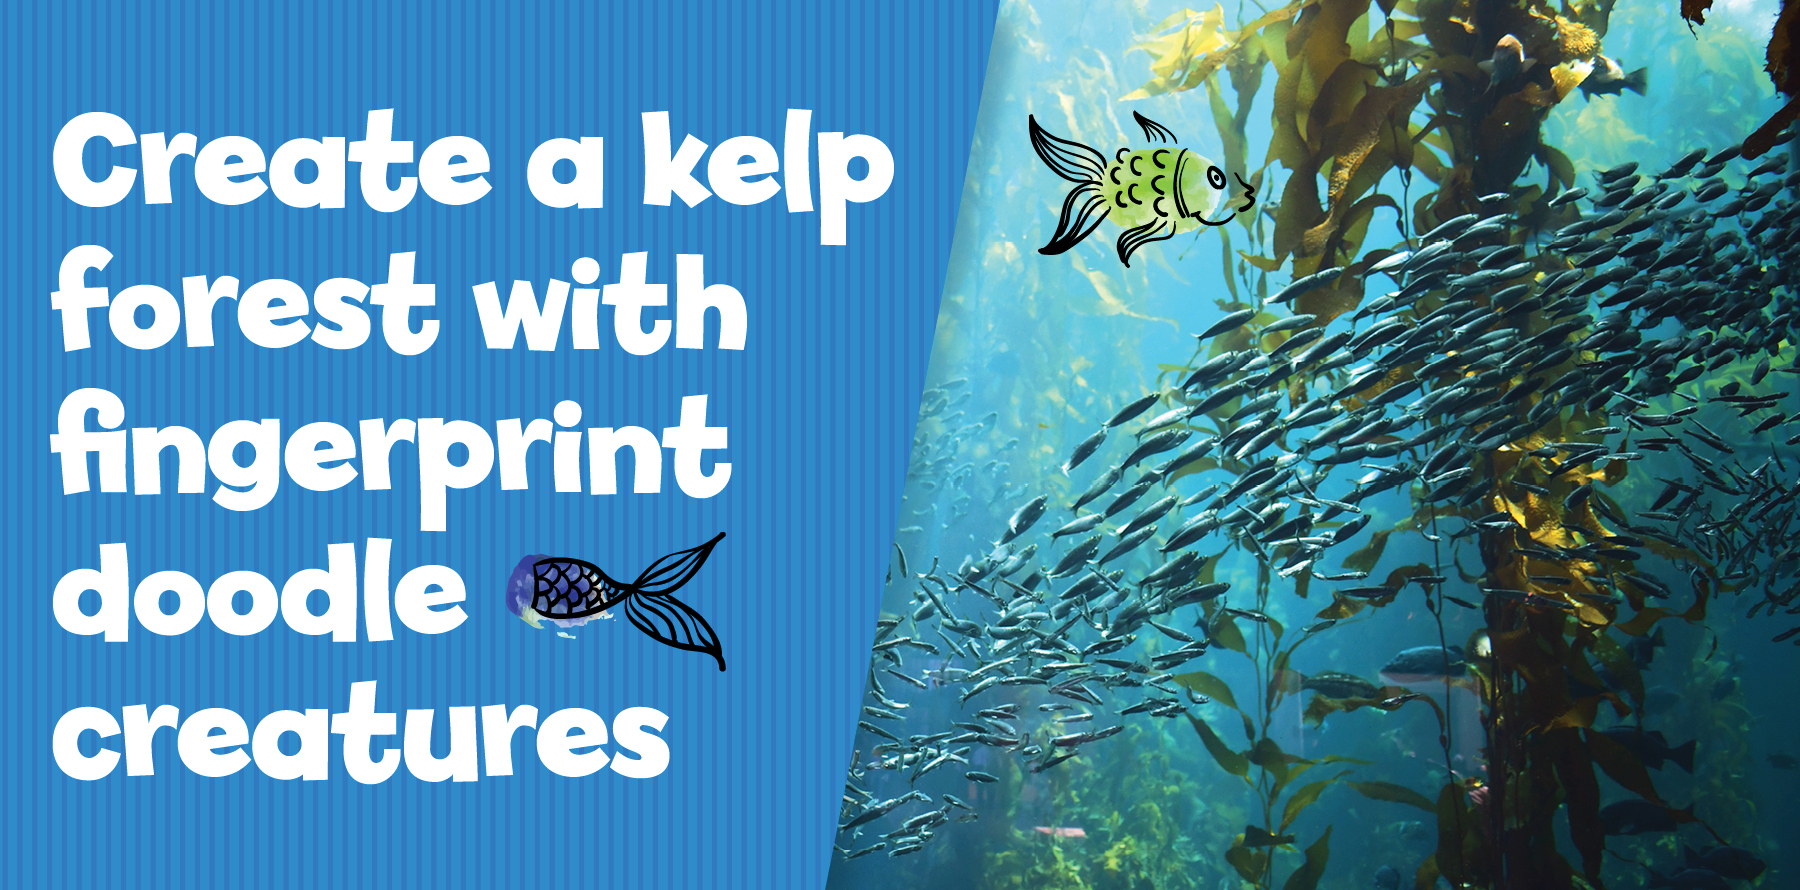 Create a kelp forest with fingerprint doodle creatures